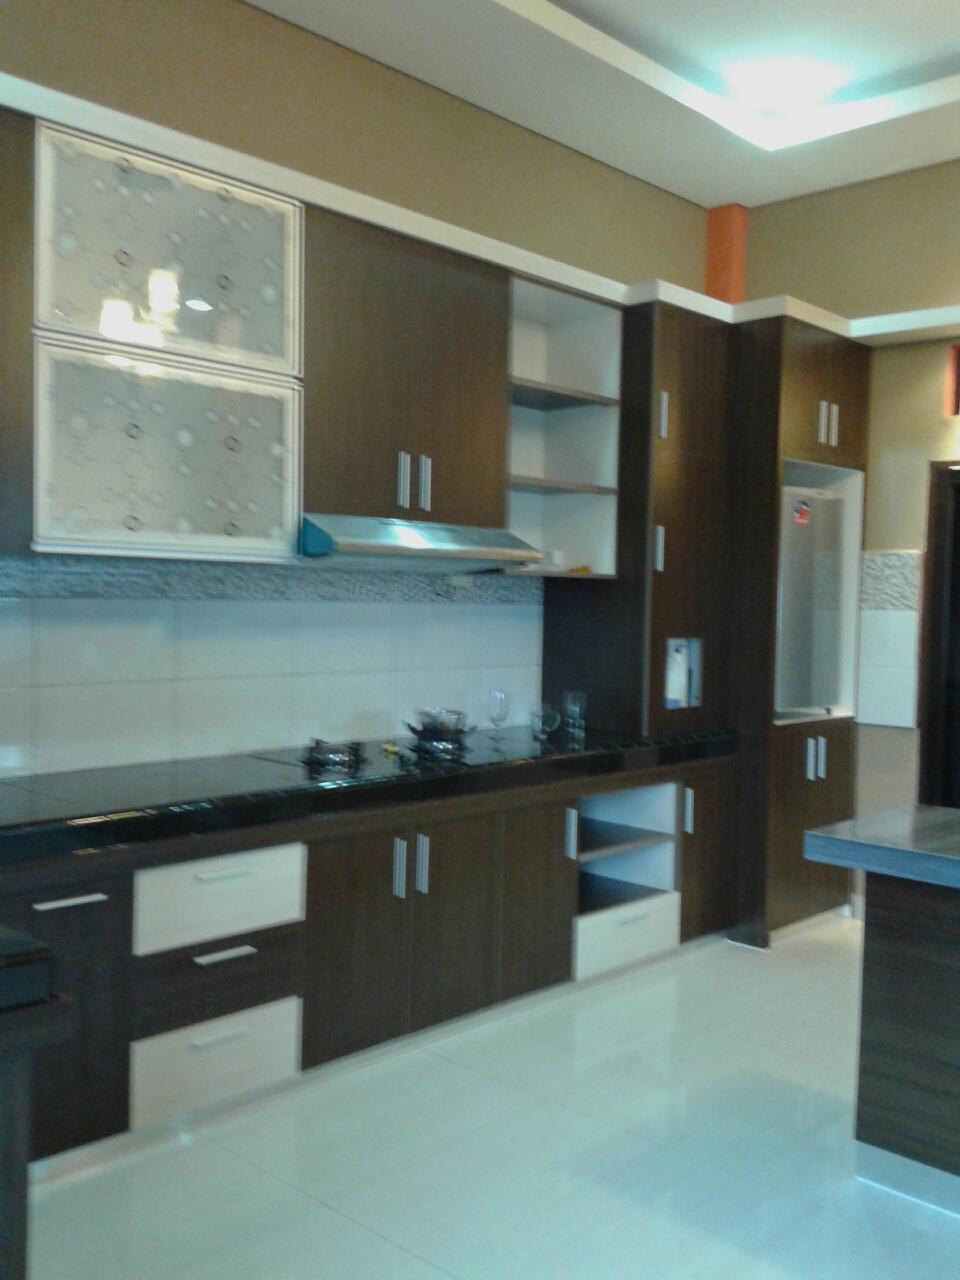 kitchenset blora desain: kitchen set area blora